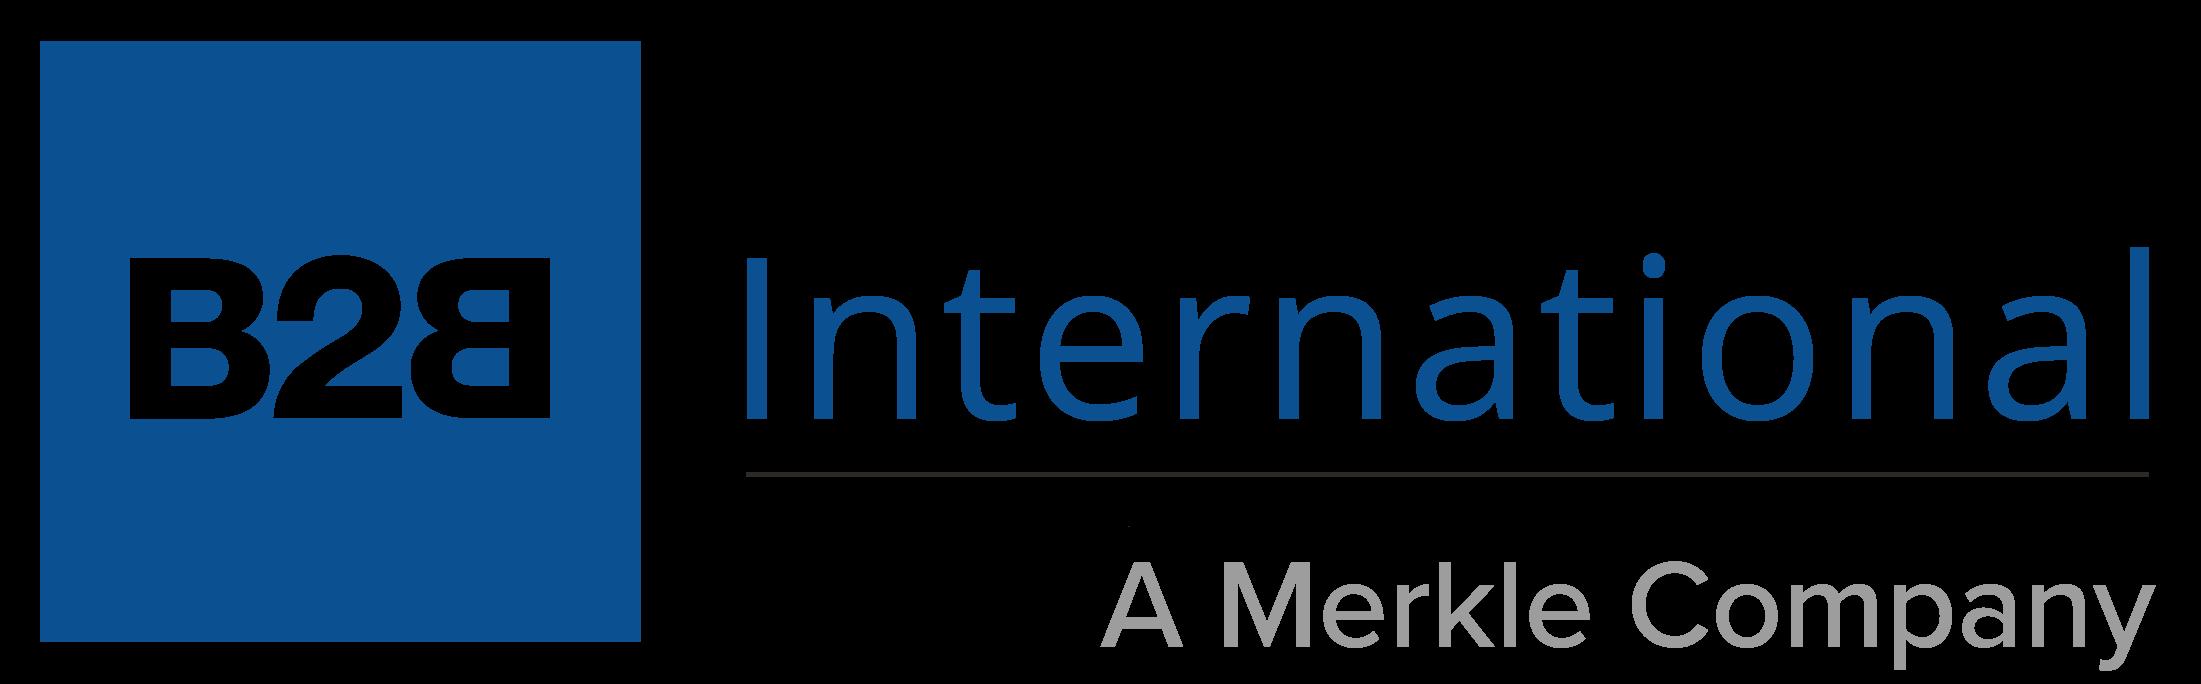 B2B International Ltd Company Logo